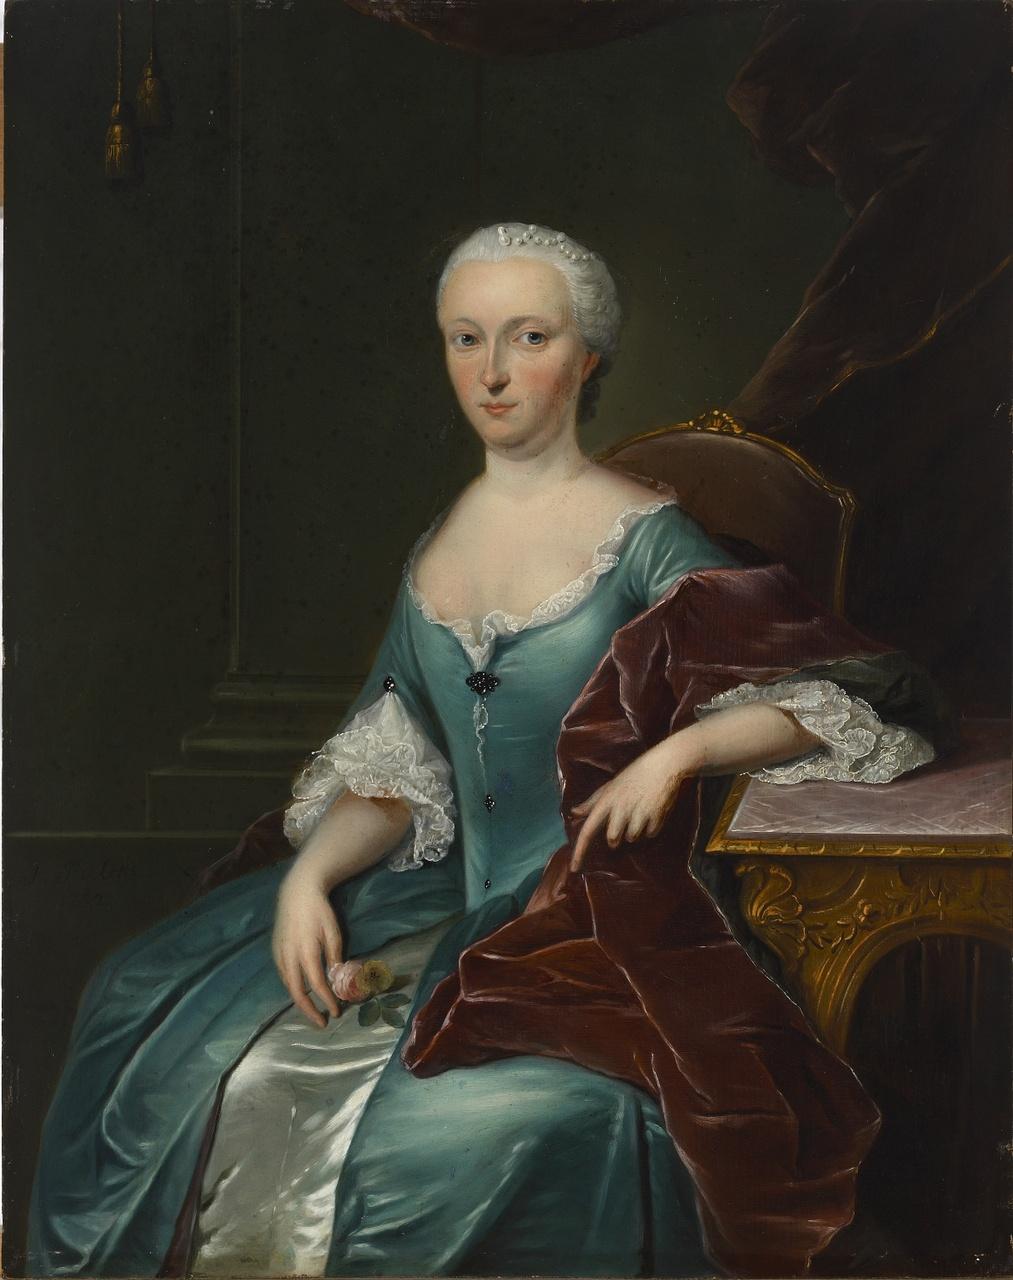 A.C. de Bye (1718-1760), Jan Palthe